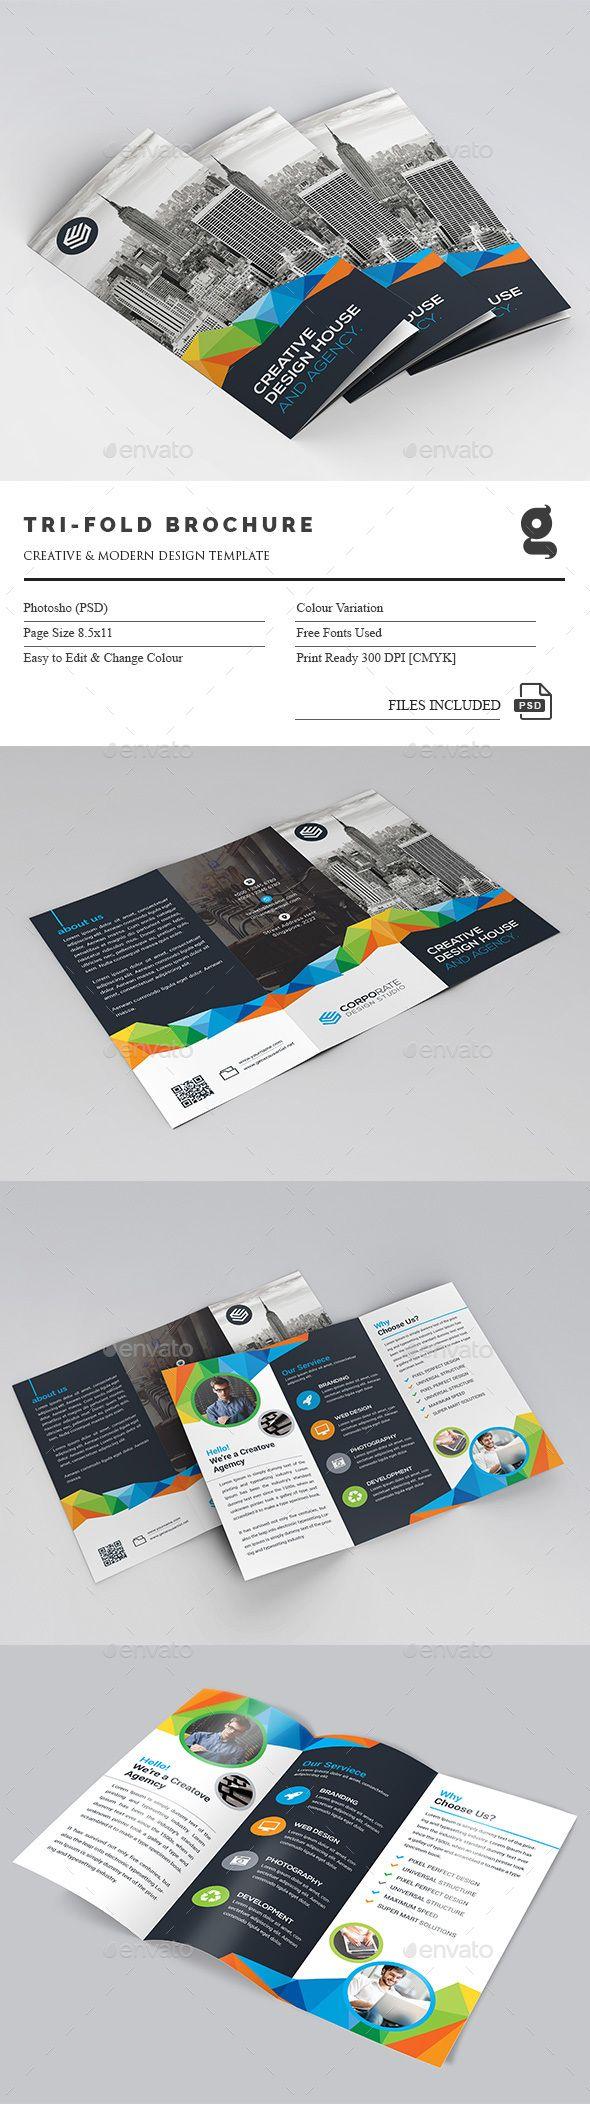 Tri-Fold Brochure Template PSD. Download here: http://graphicriver.net/item/trifold-brochure/15064313?ref=ksioks